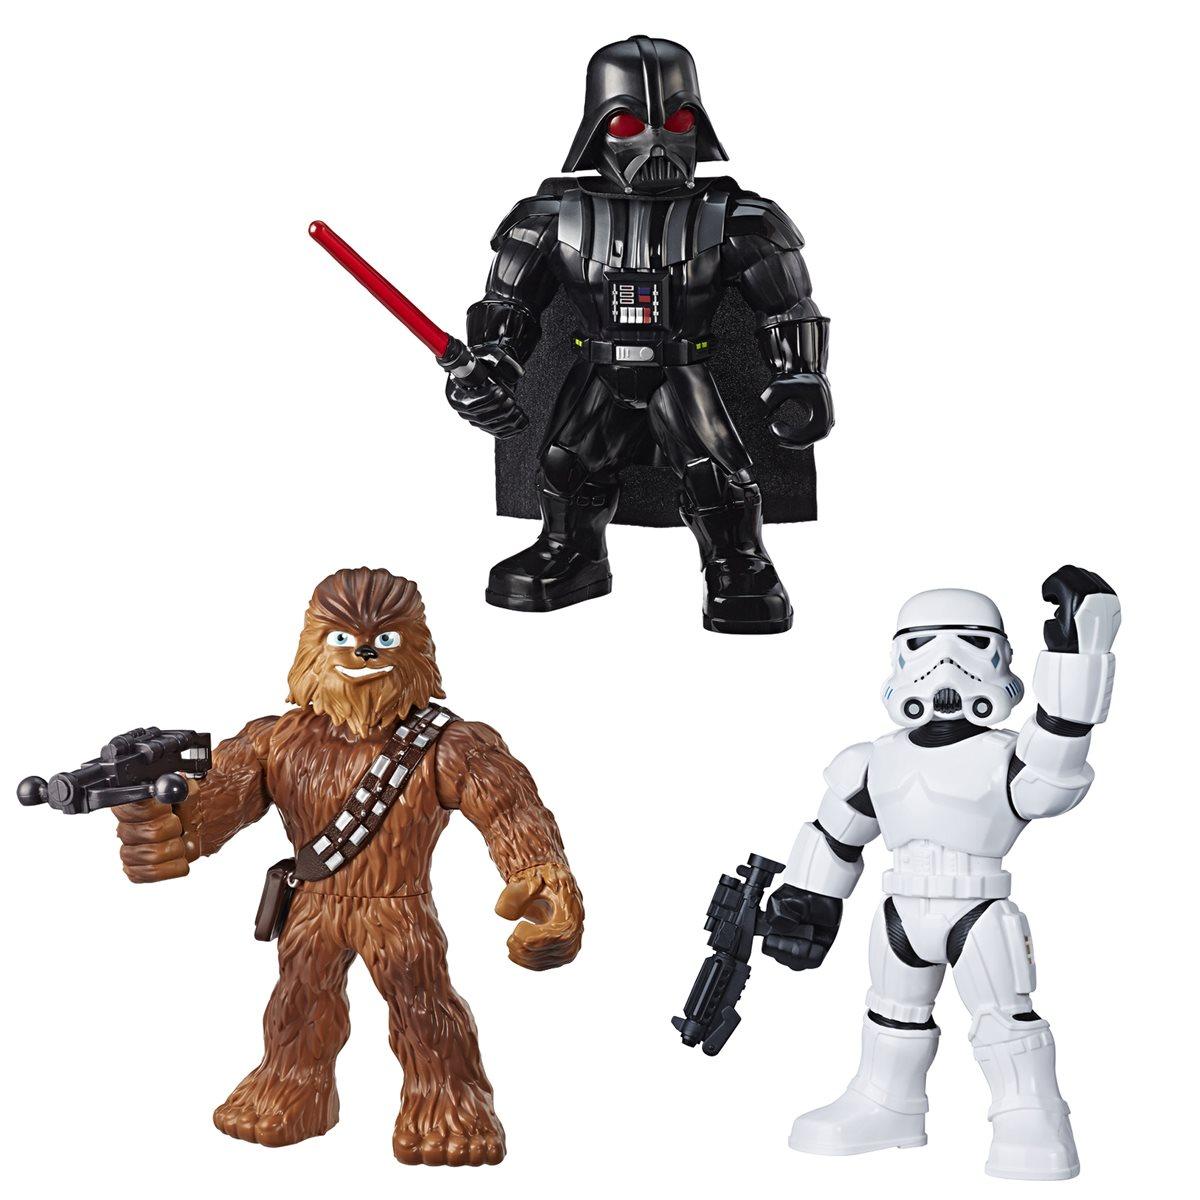 Star Wars Galactic Heroes Mega Mighties 3-Pack 10-Inch Action Figures New 2020